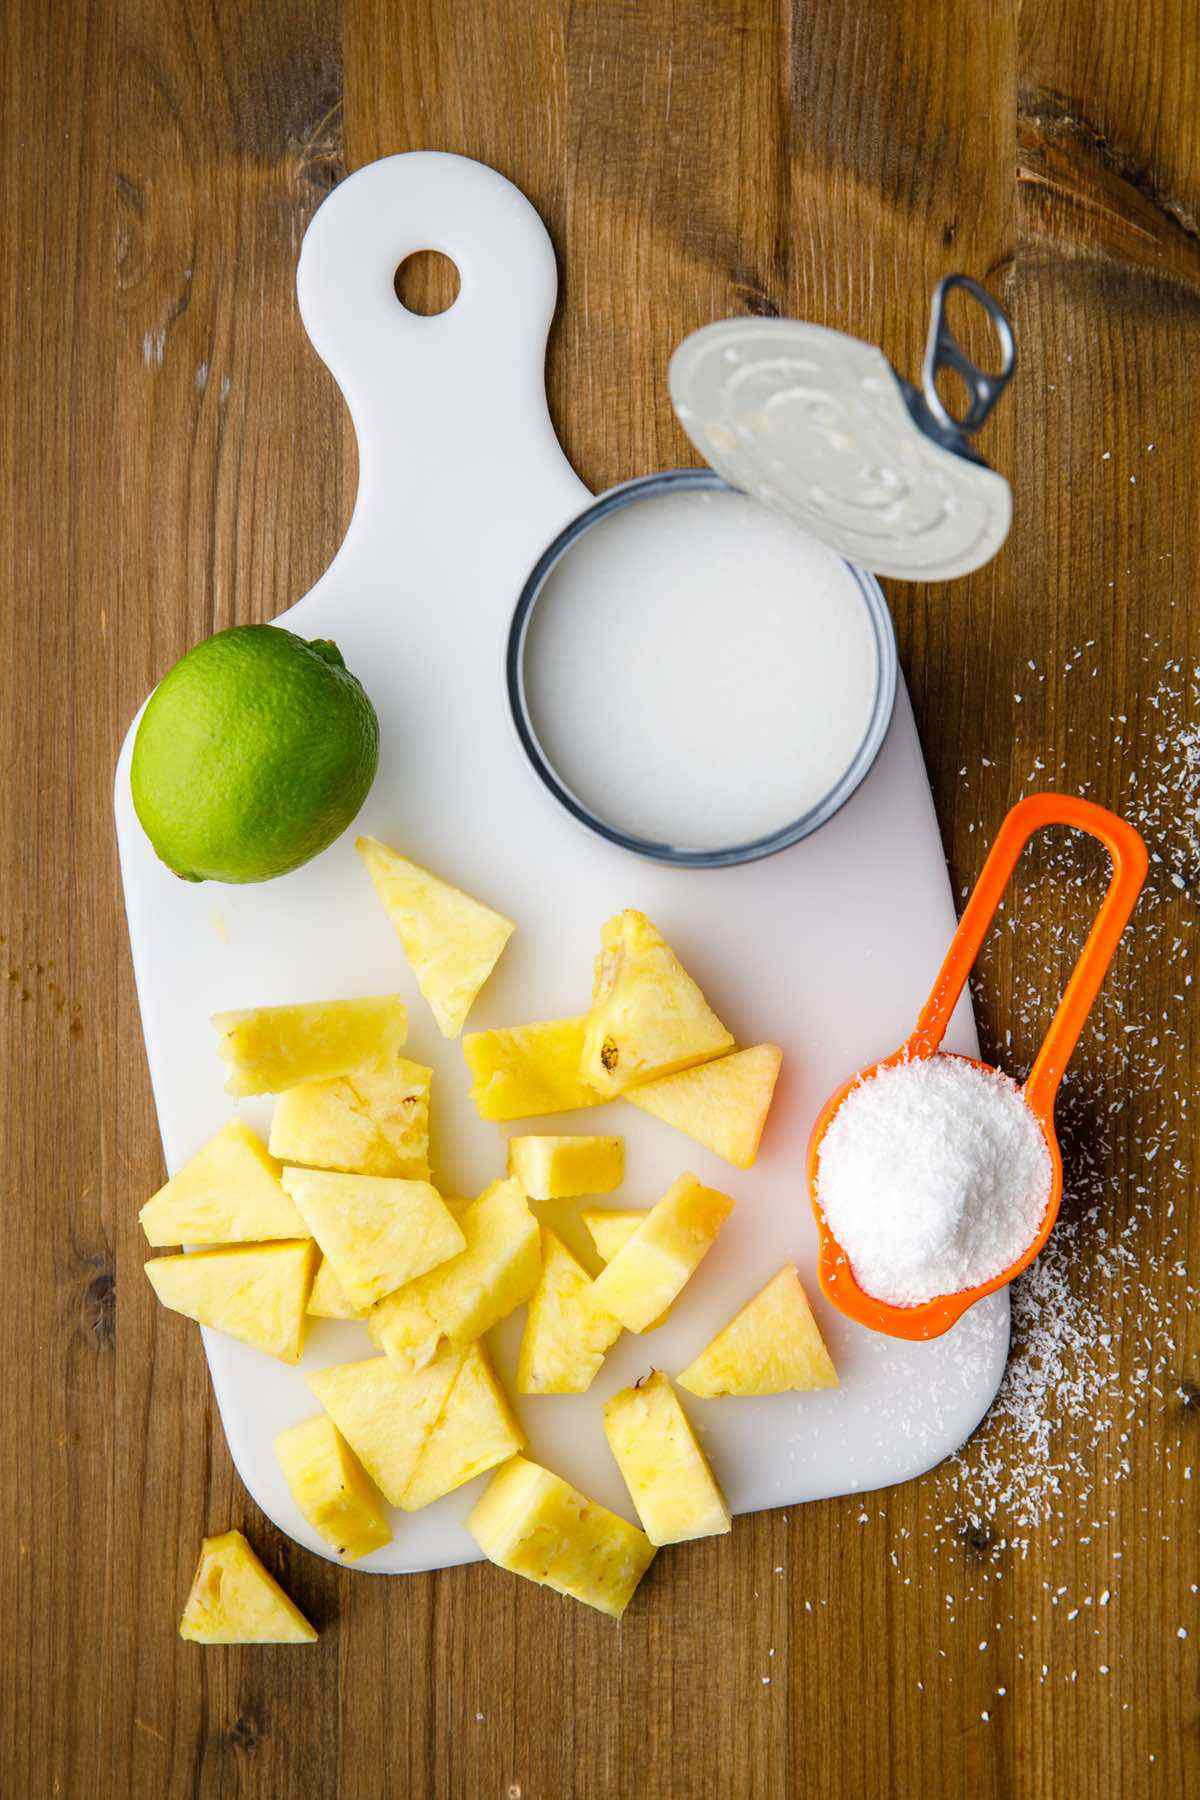 prepping smoothie ingredients